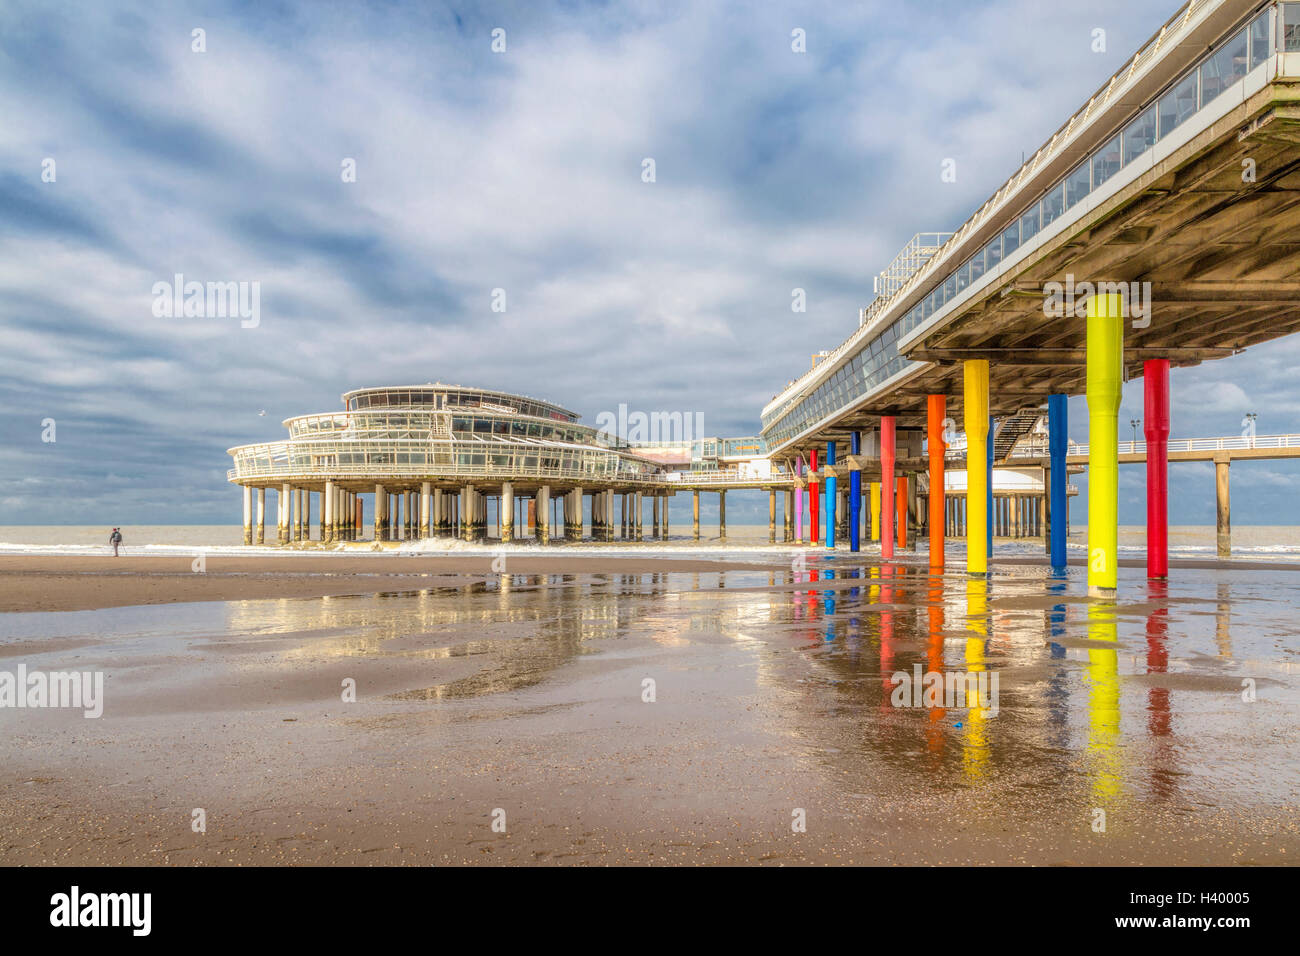 Beach And Pier Of Scheveningen Den Haag The Hague On